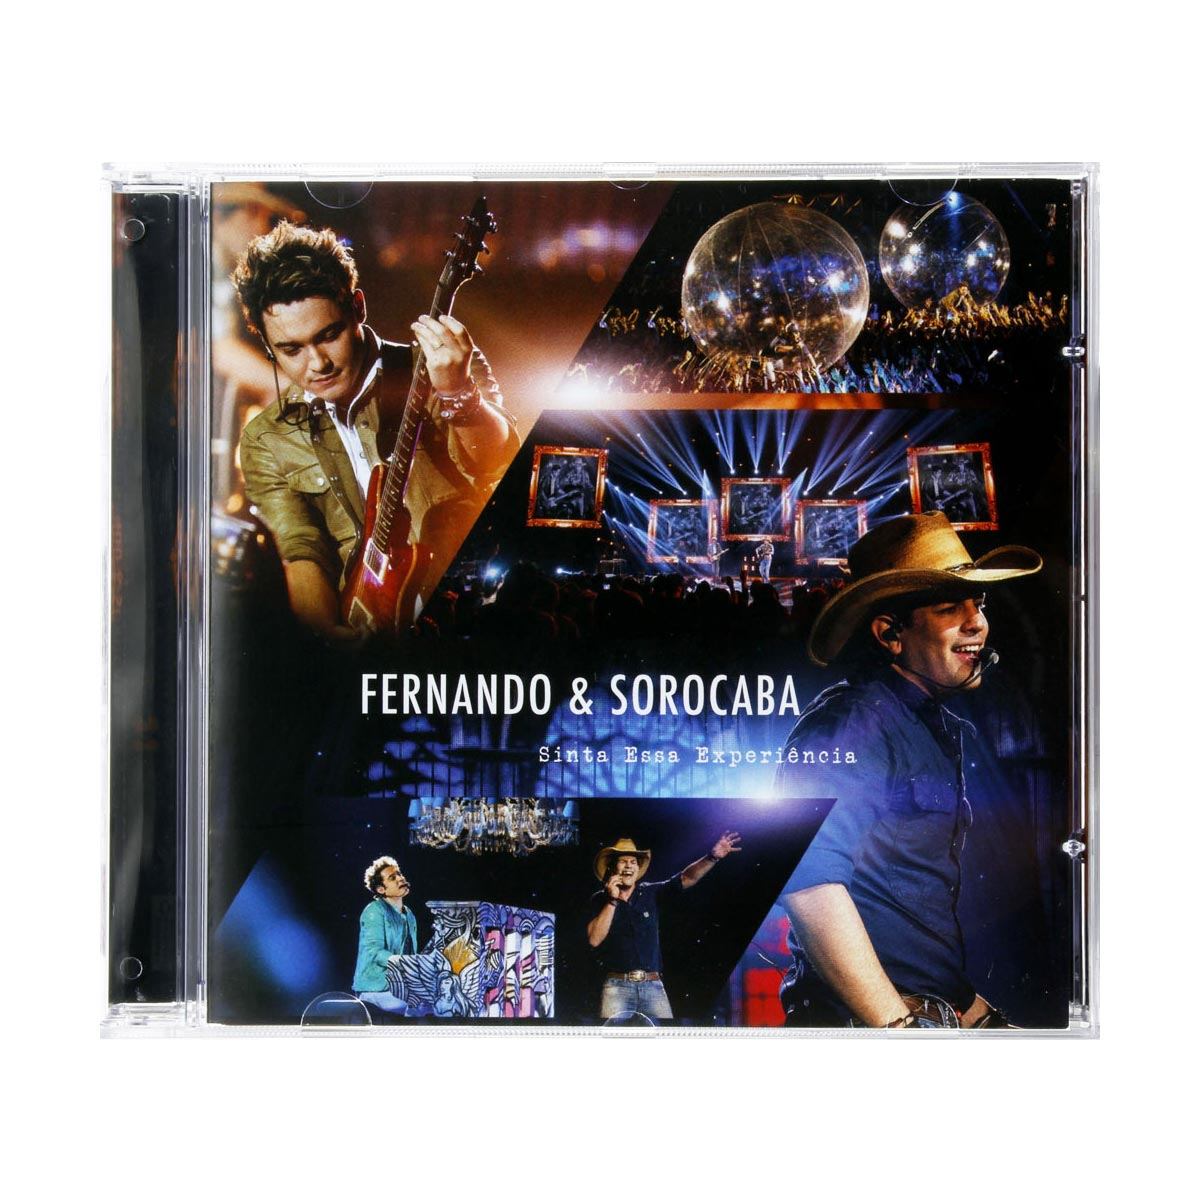 CD Fernando & Sorocaba Sinta Essa Experiência